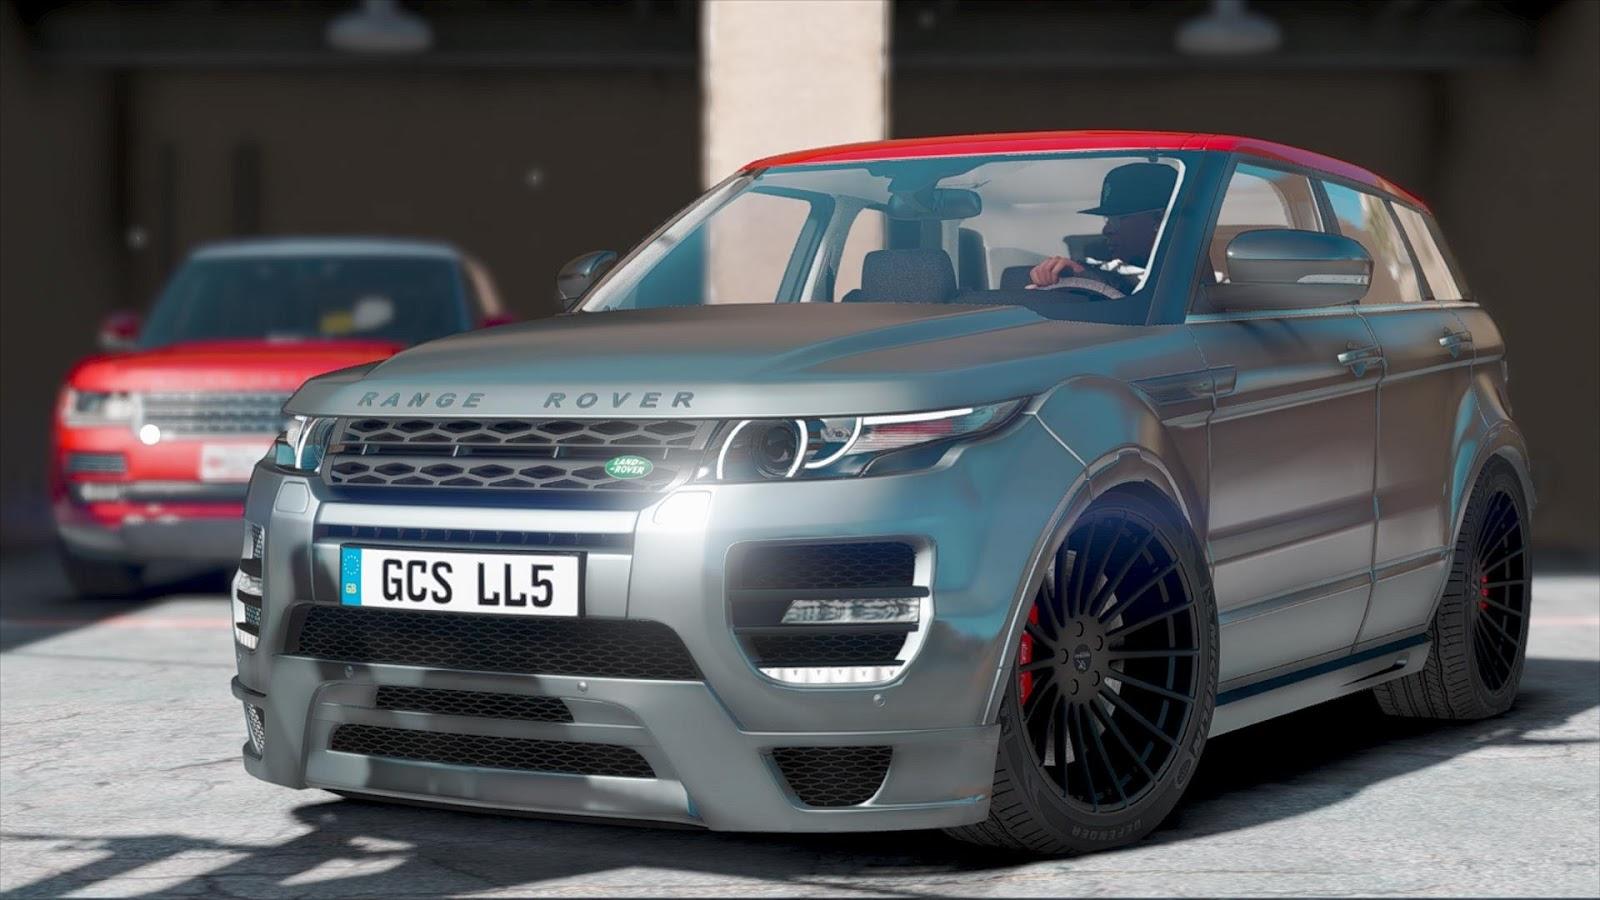 Car Mechanic Simulator 2018 Mods Mods For Games >> Range Rover Evoque Tuning by HAMANN v1.0   GTA 5 Mod